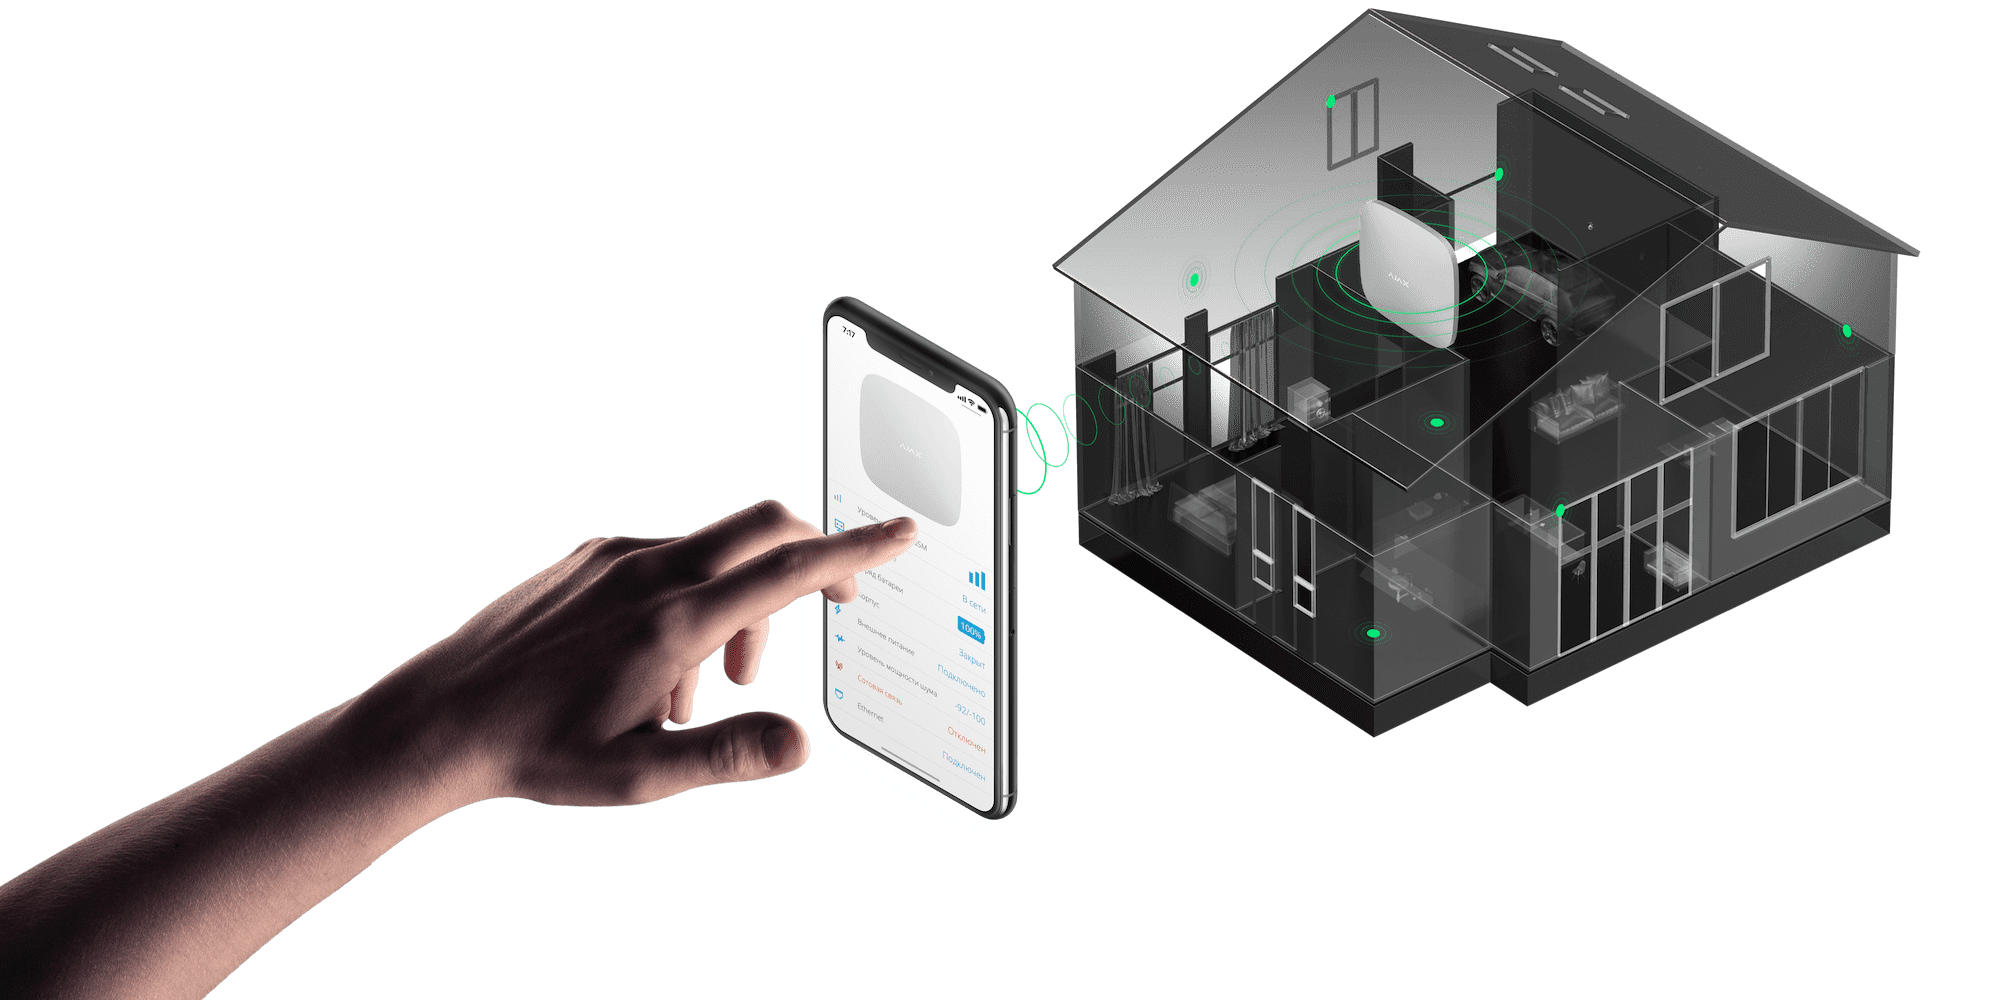 Gestion du système d'alarme Ajax via smartphone